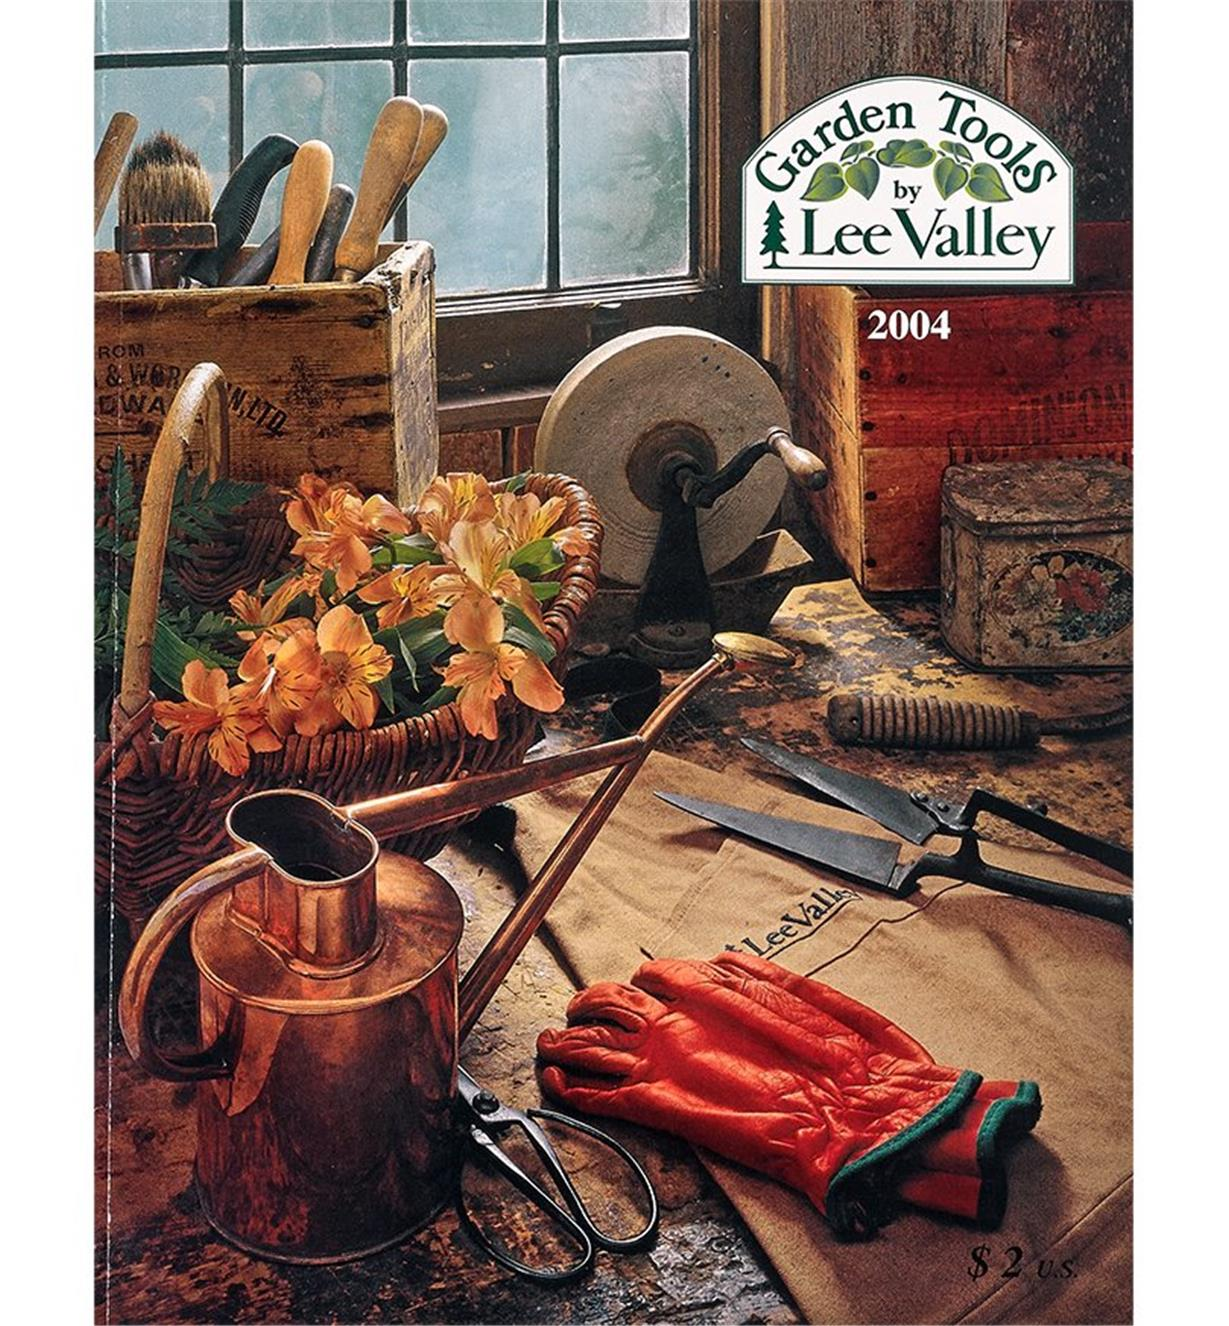 UG0204 - Garden Tools 2004, US